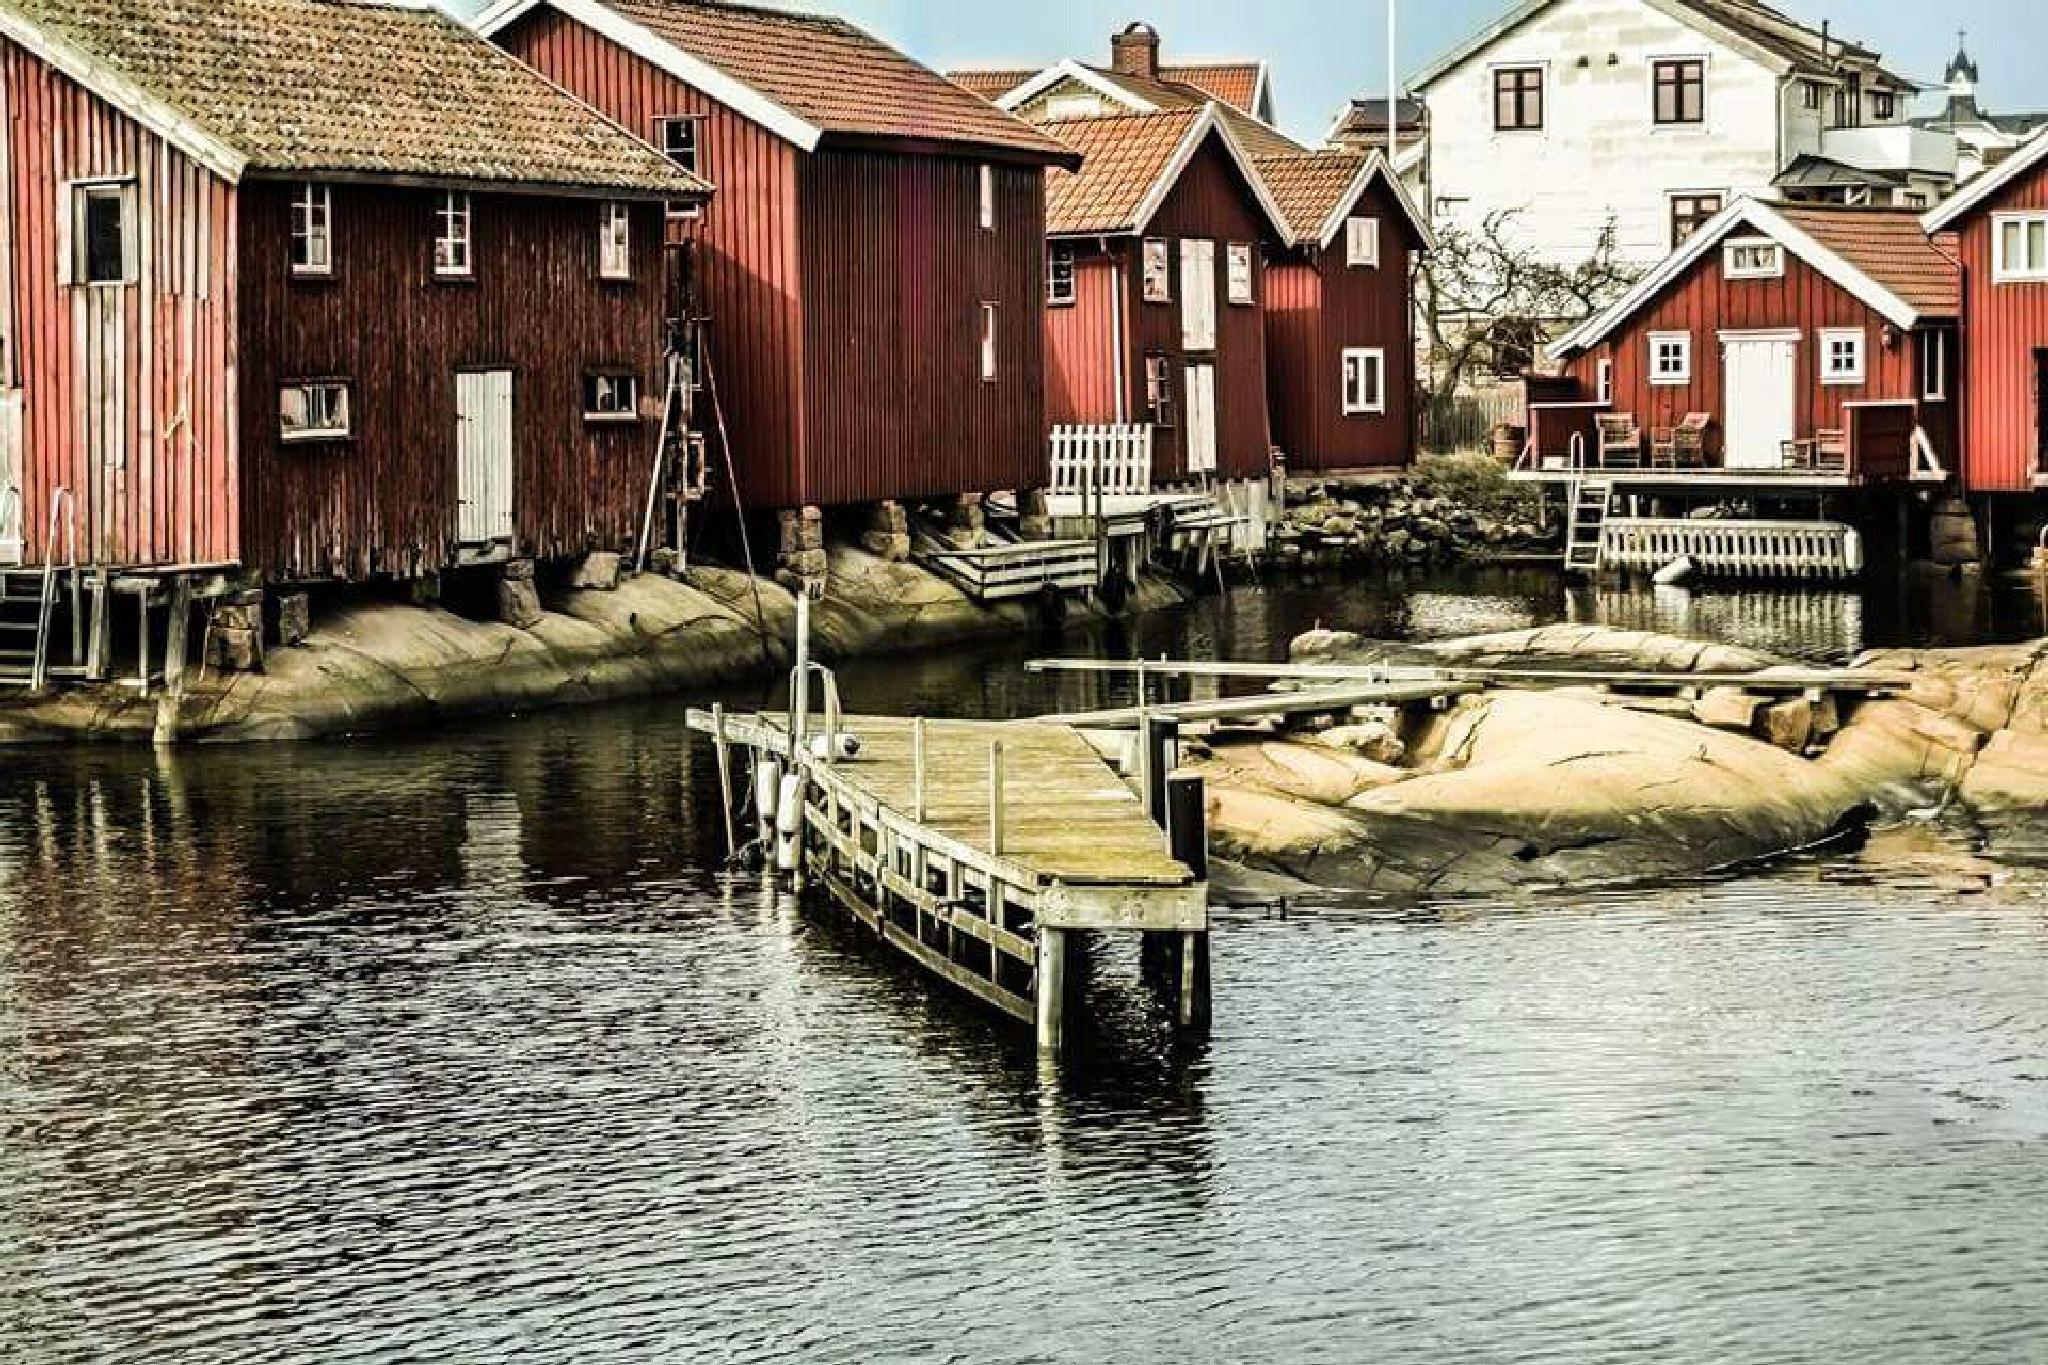 8471 by Eva Arbfors